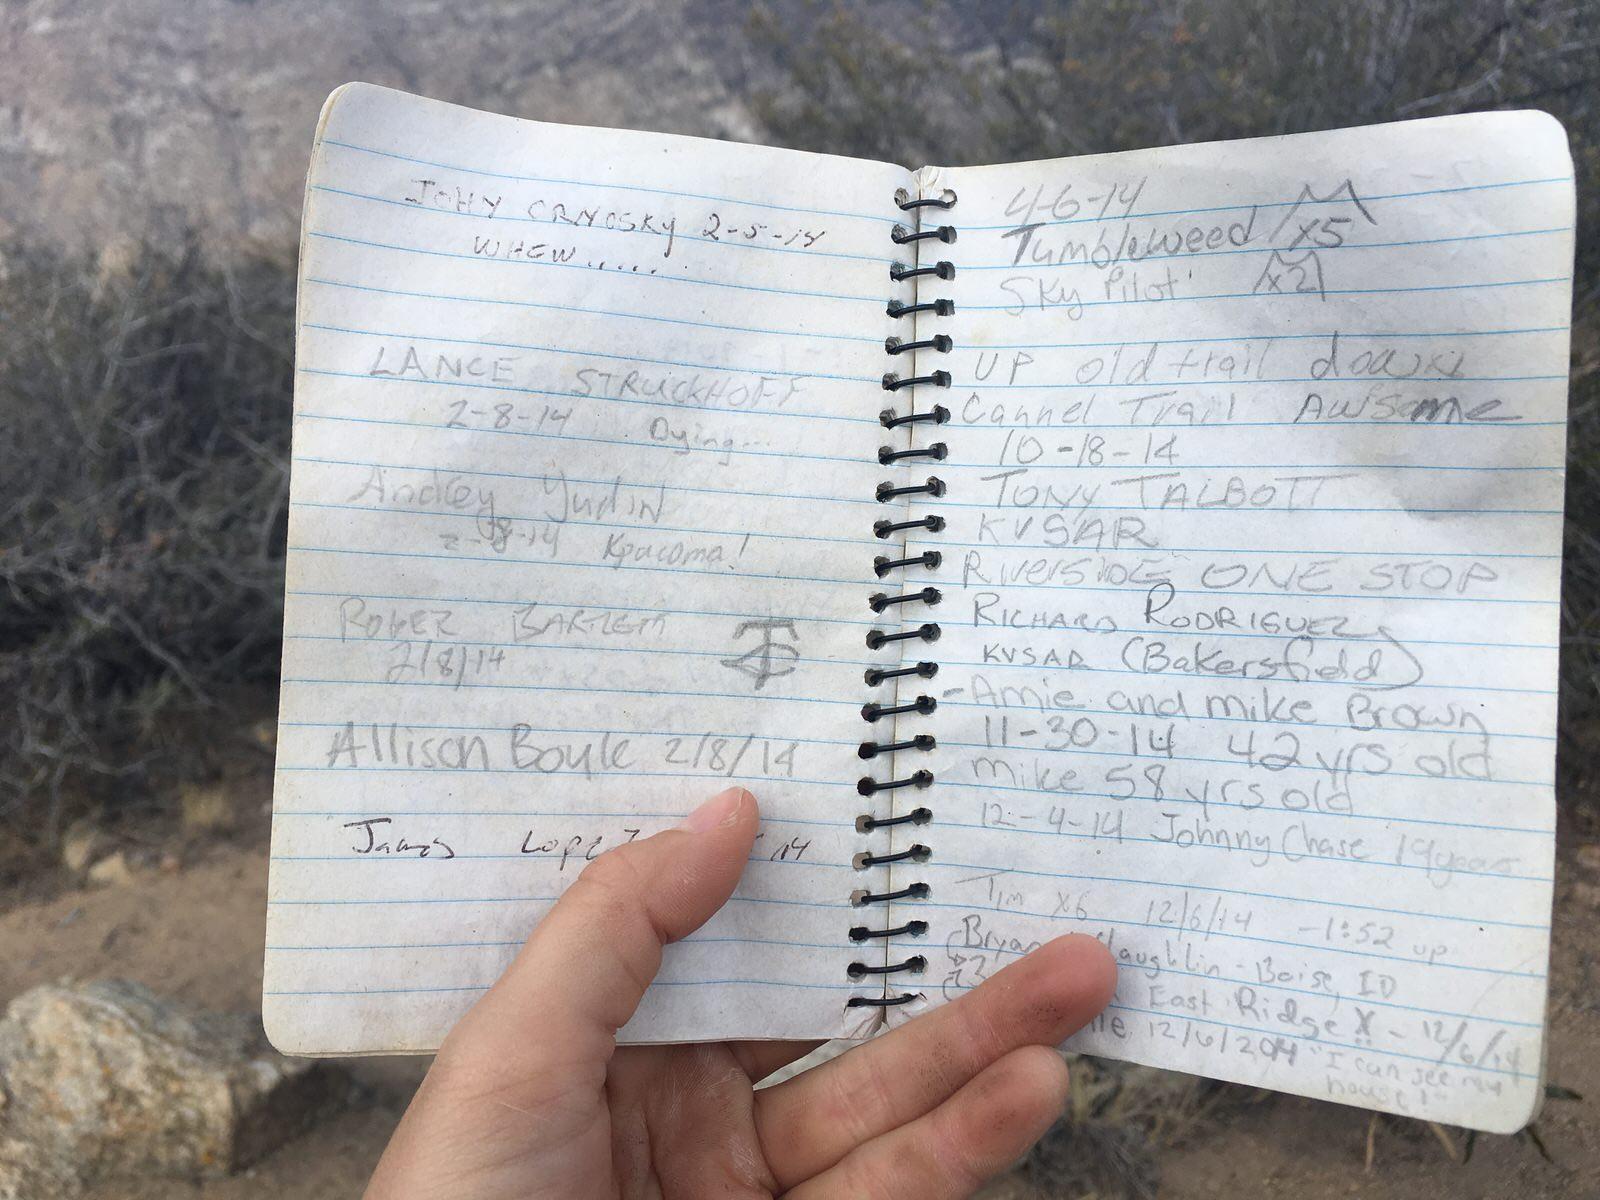 summit-register-hike-powers-peak-kernville-california-2